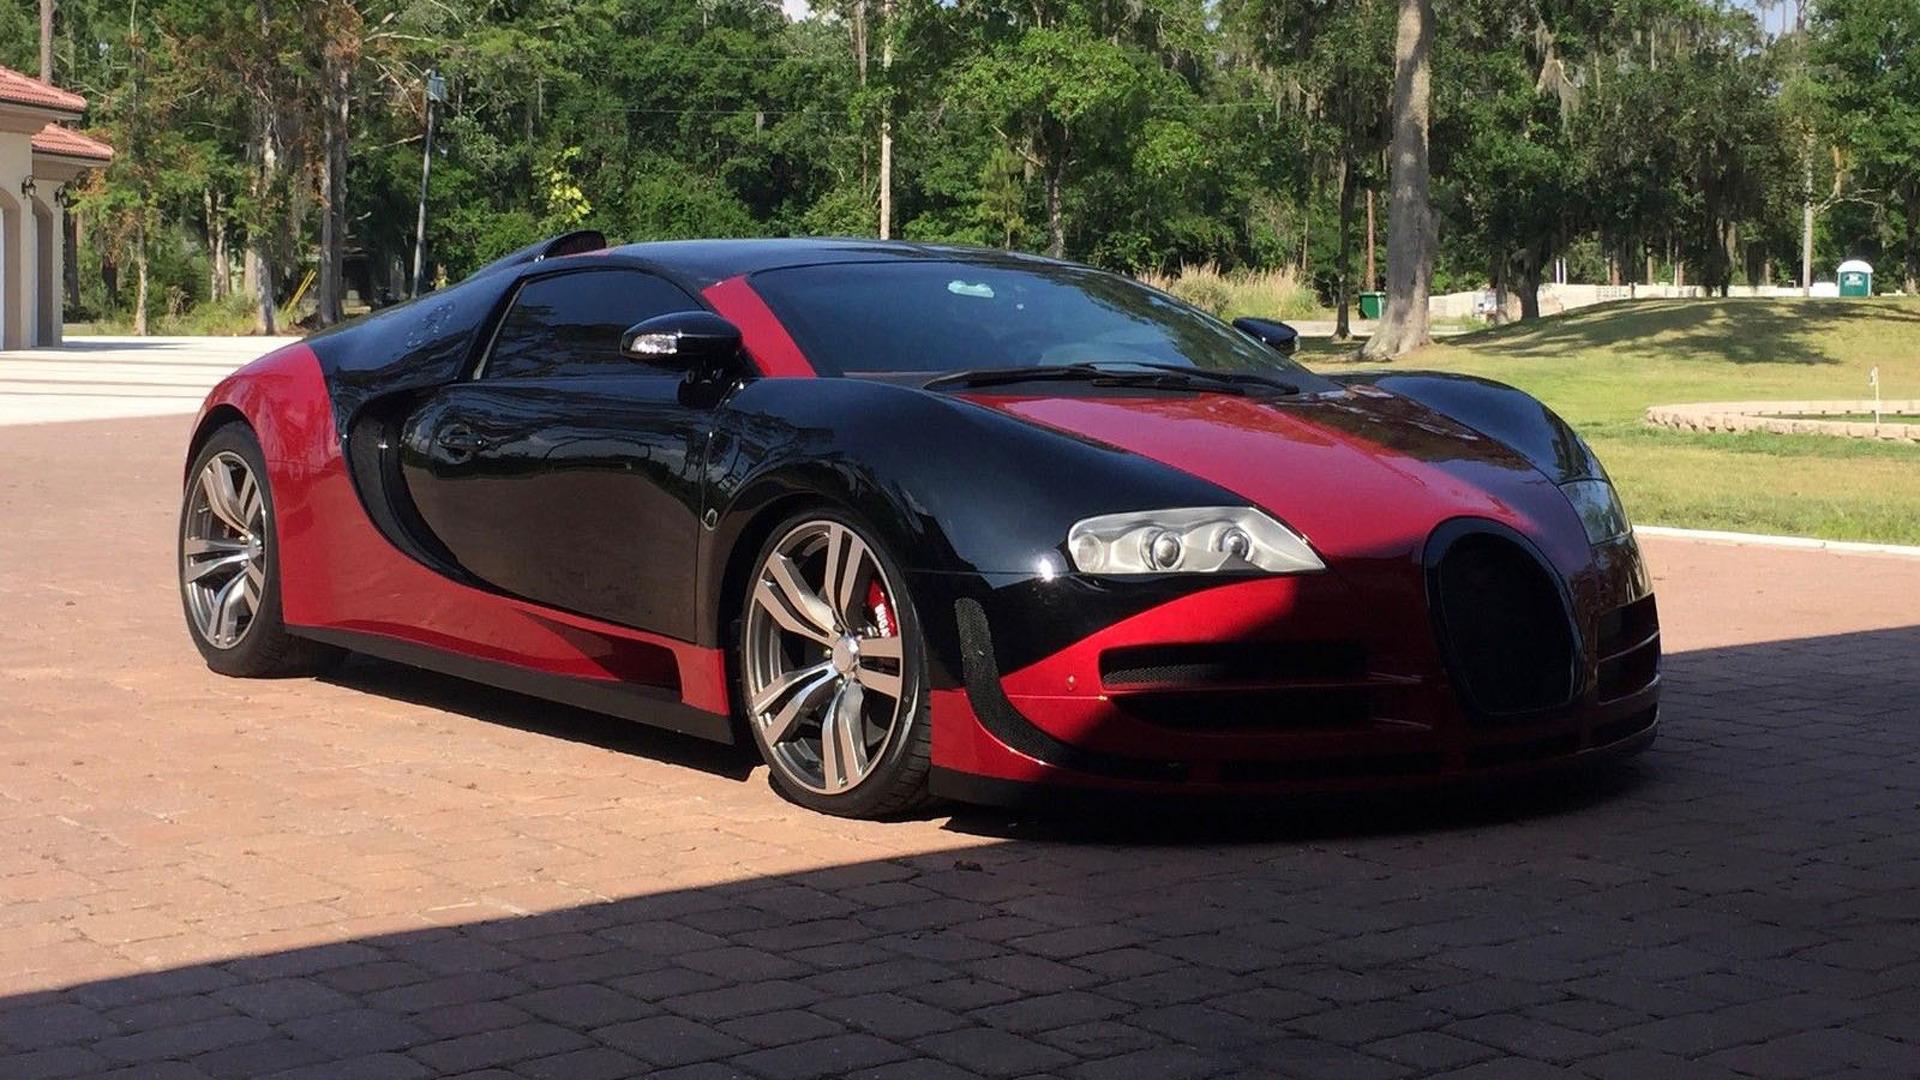 Buy a Pontiac GTO disguised as a Bugatti Veyron for $125k